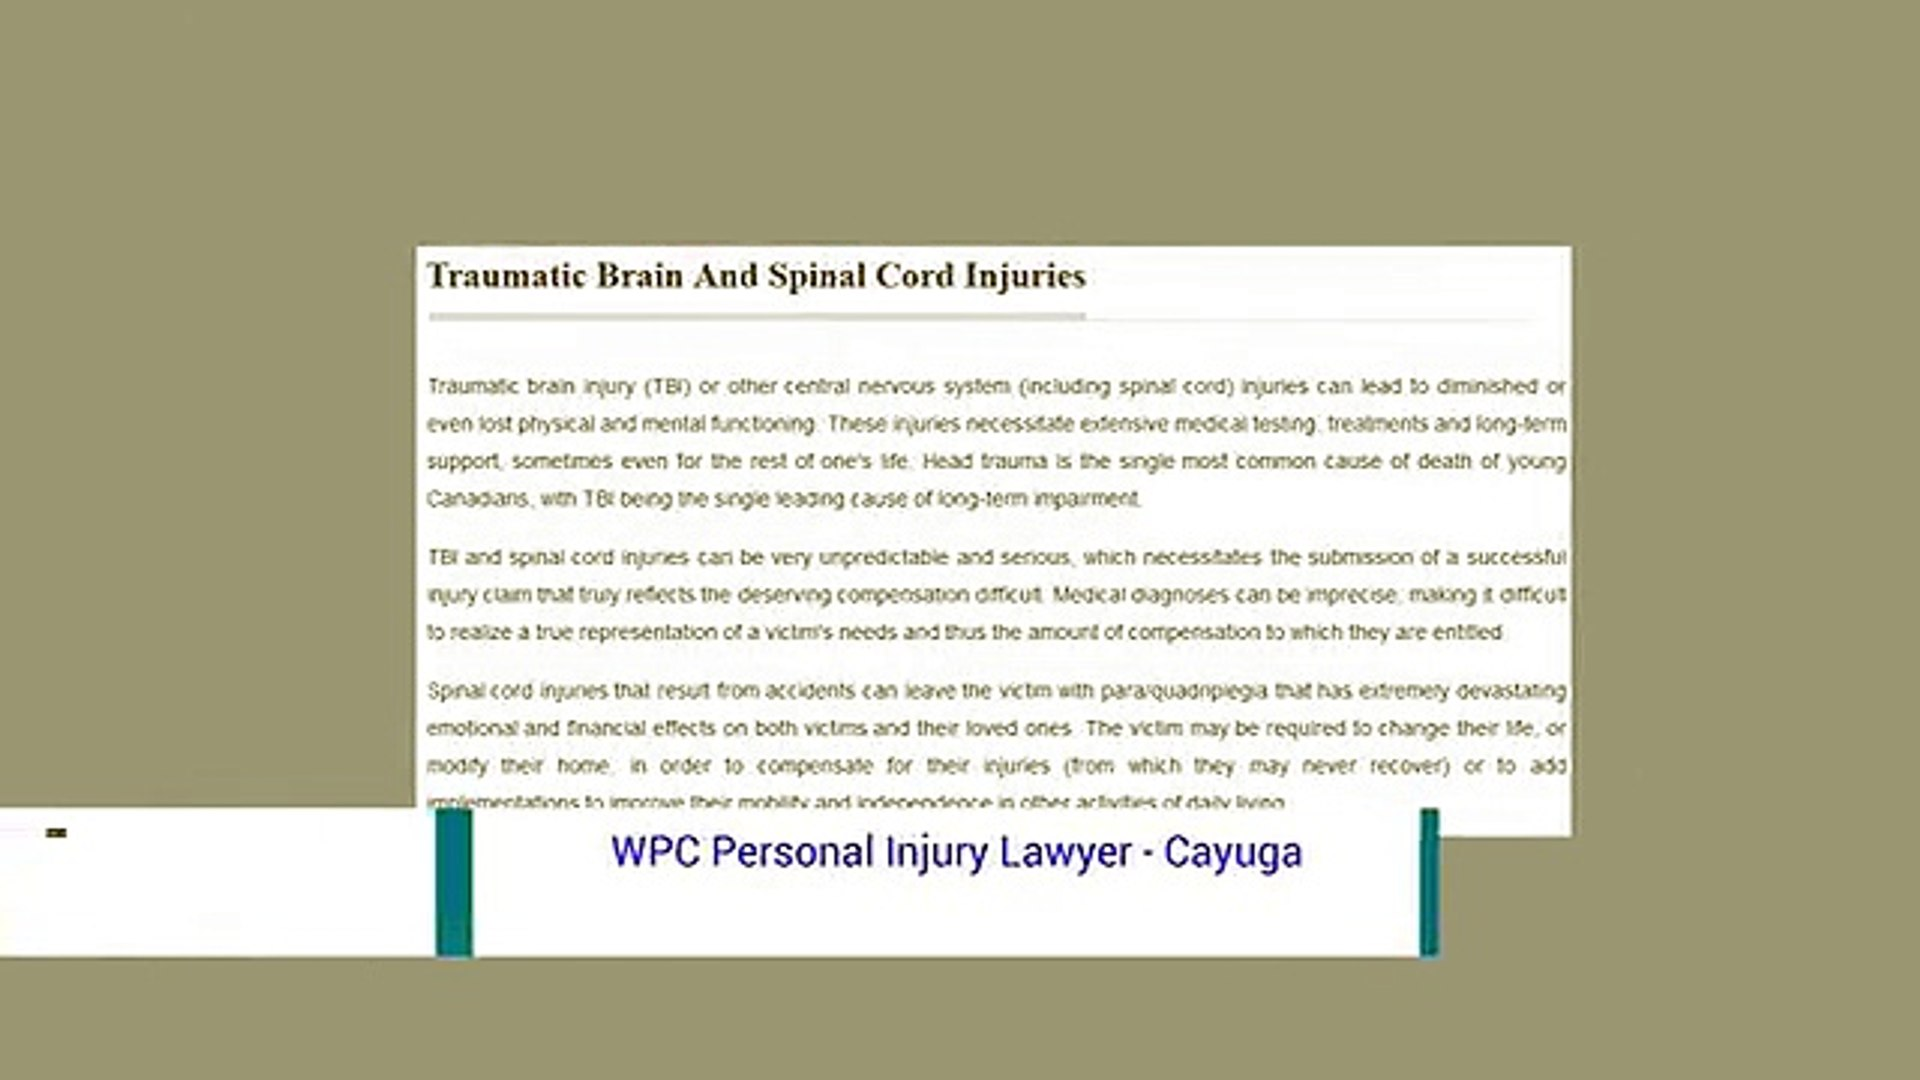 Personal Injury Lawyer Cayuga - WPC Personal Injury Lawyer (800) 964-1839